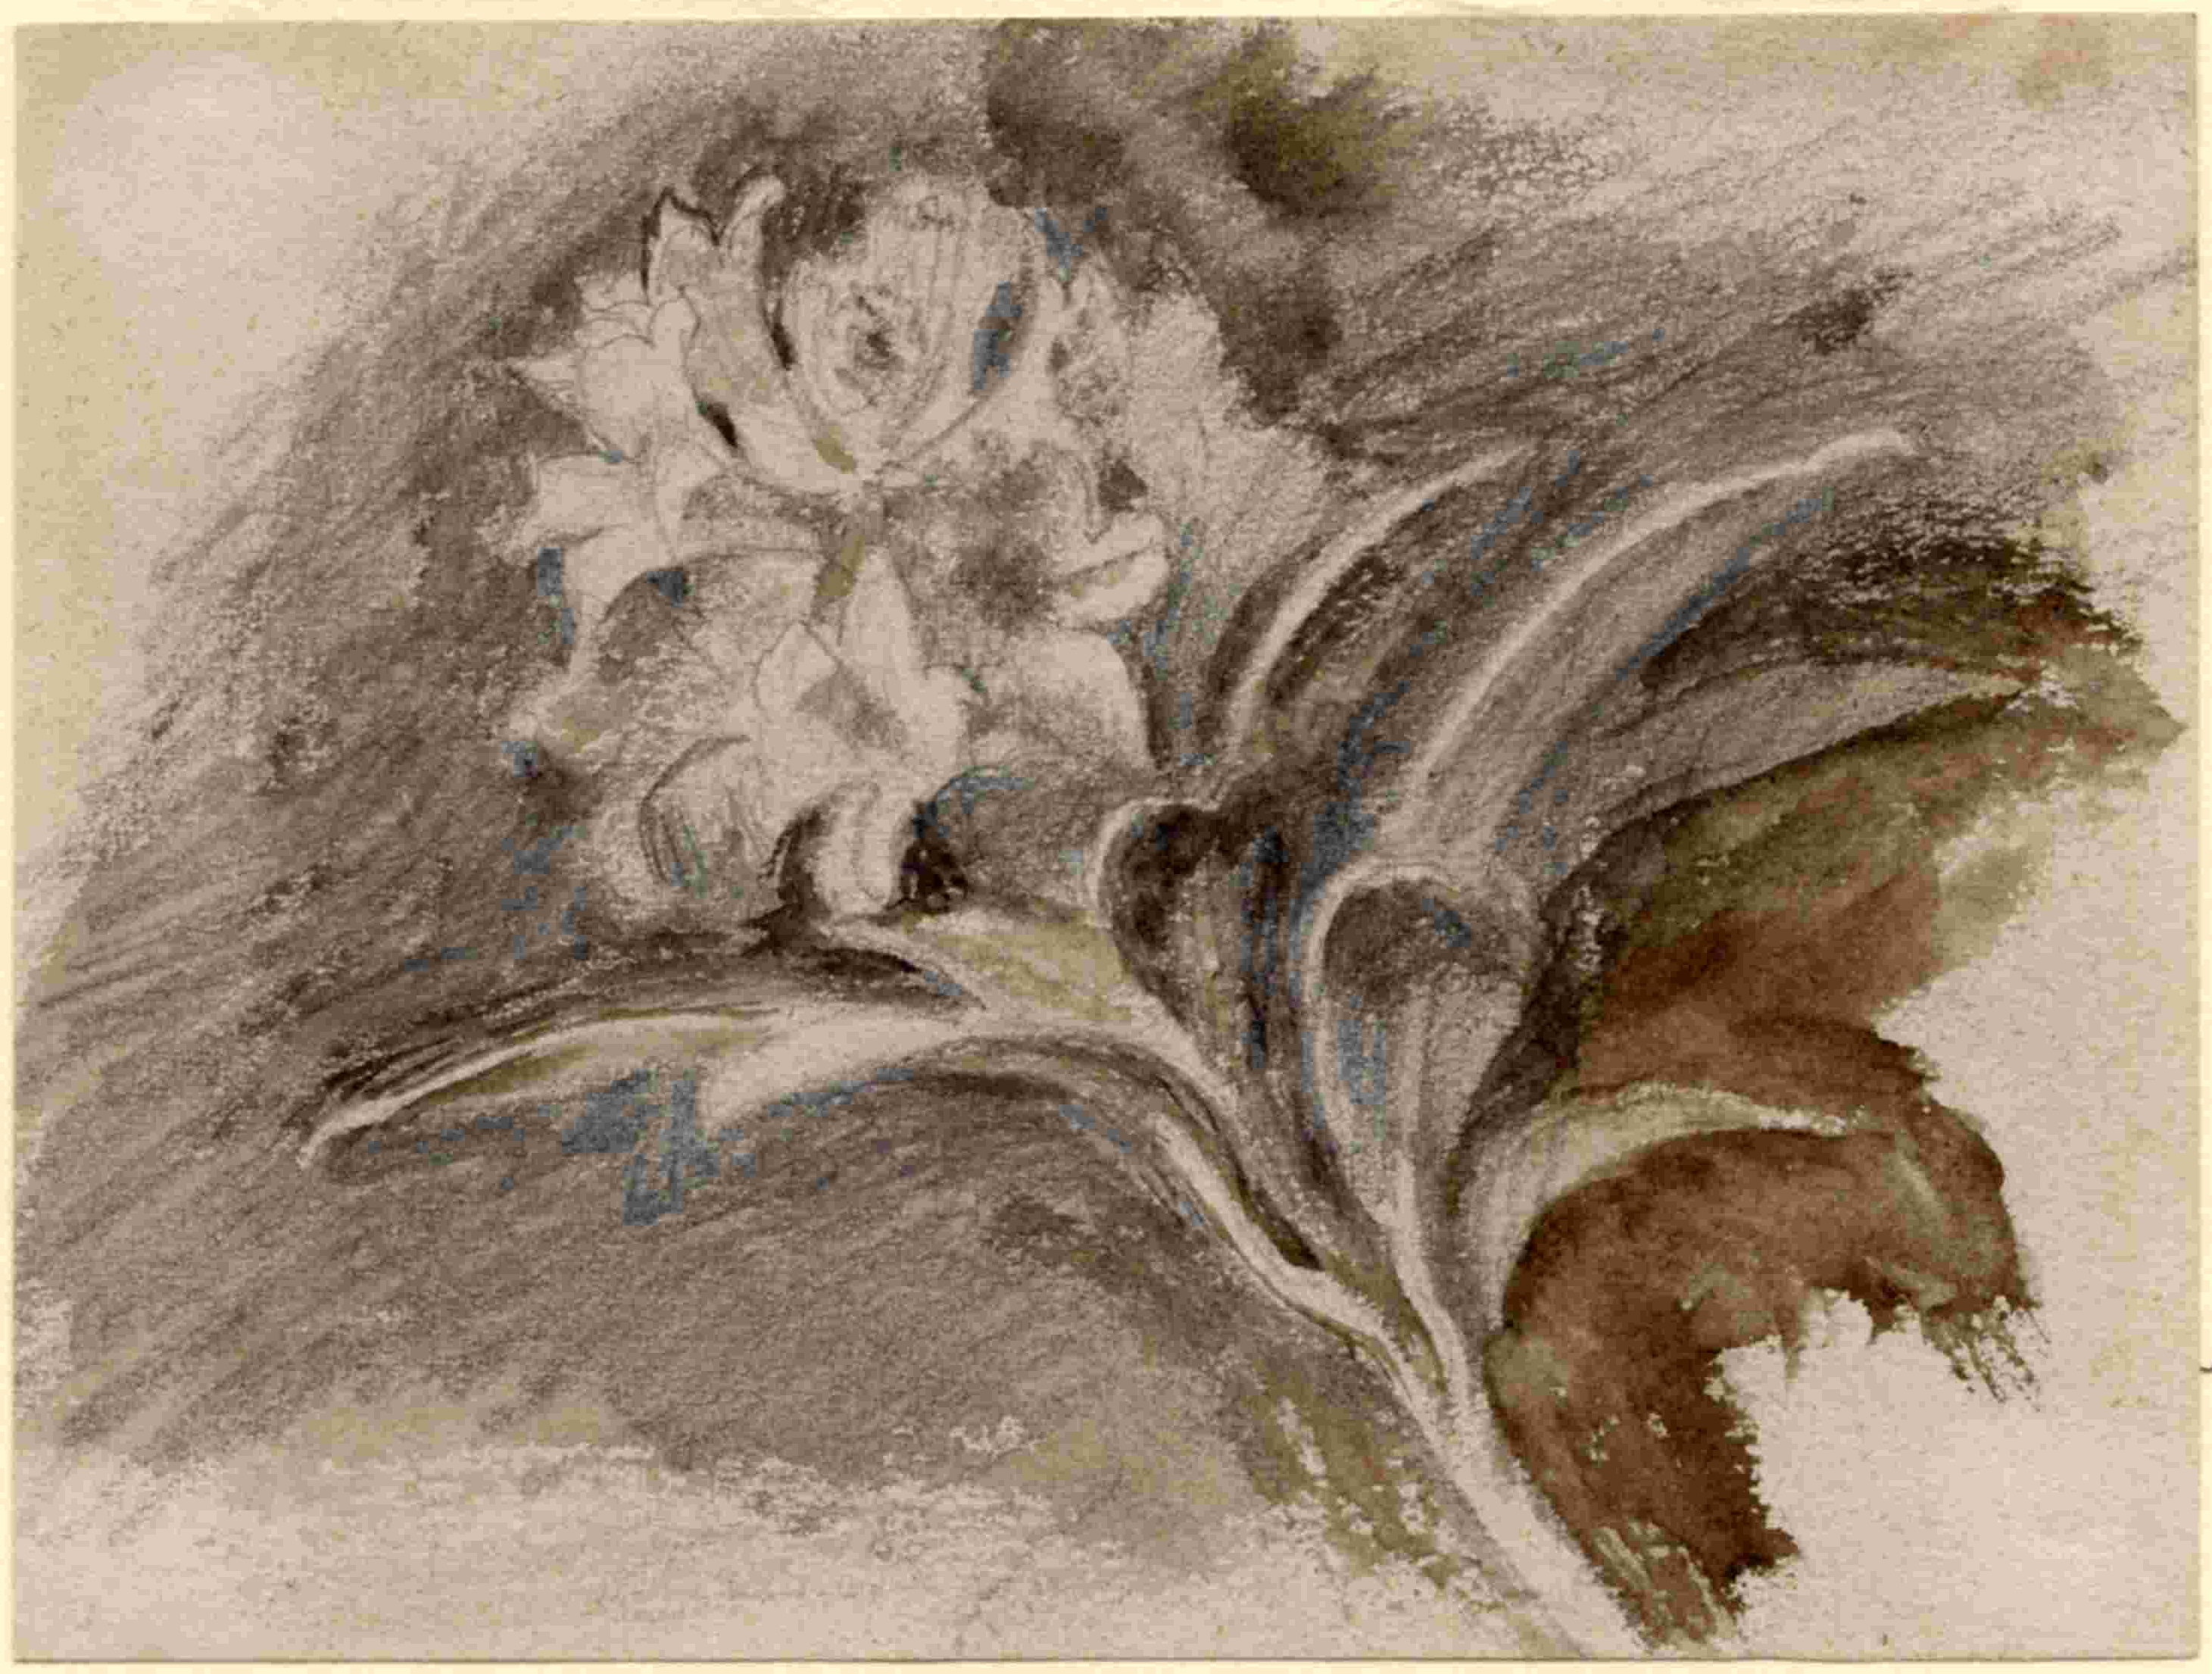 John Ruskin, Flower Studies, RF1274-2 © Ruskin Foundation